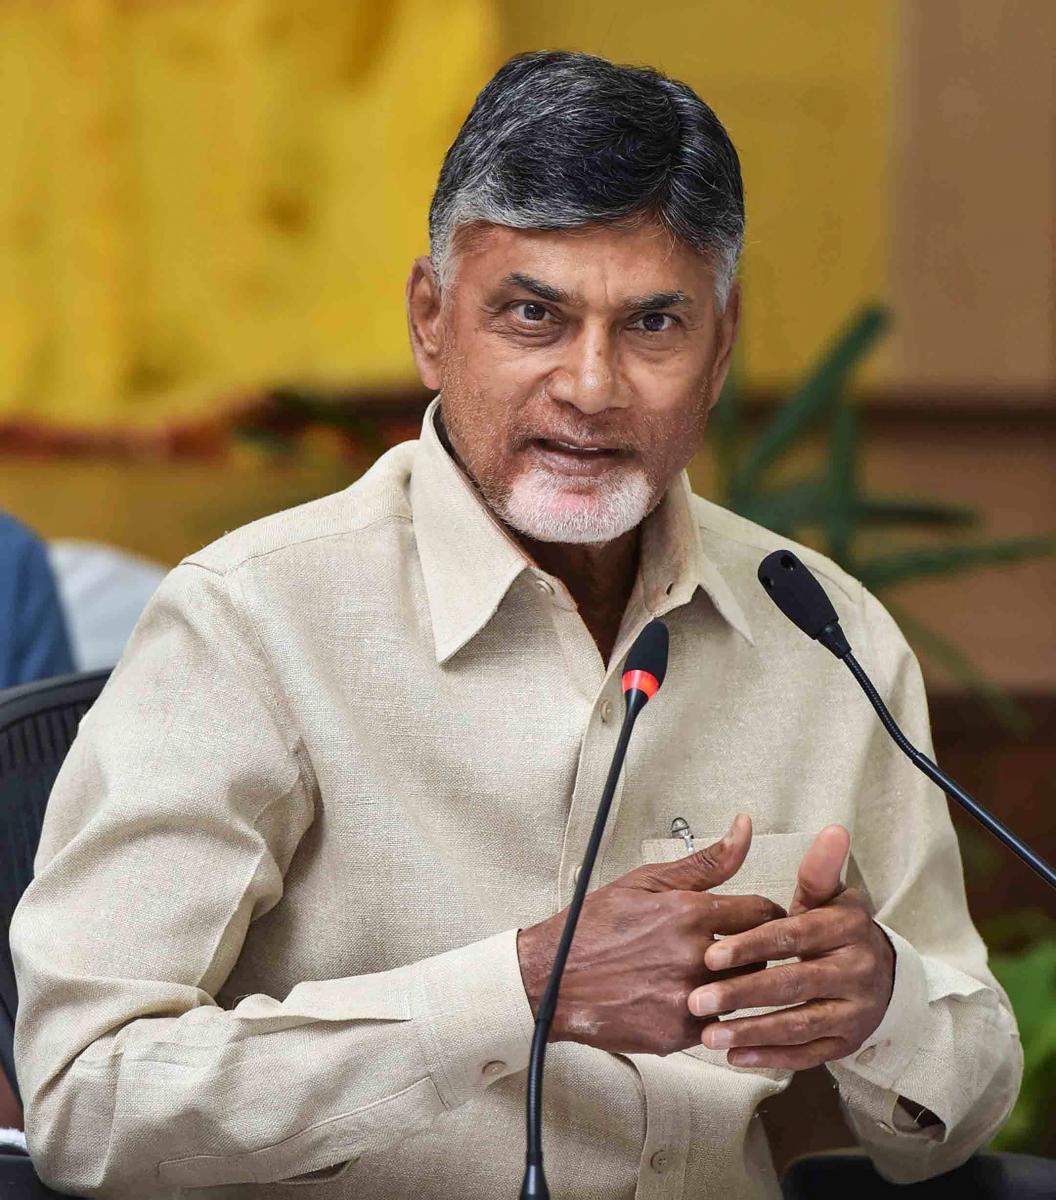 Vijaywada: Andhra Pradesh Chief Minister N Chandrababu Naidu seen addressing a press conference, in Vijaywada, in this dated (Saturday, Jan 12, 2019) file photo. (PTI Photo) (PTI1_12_2019_000220B)